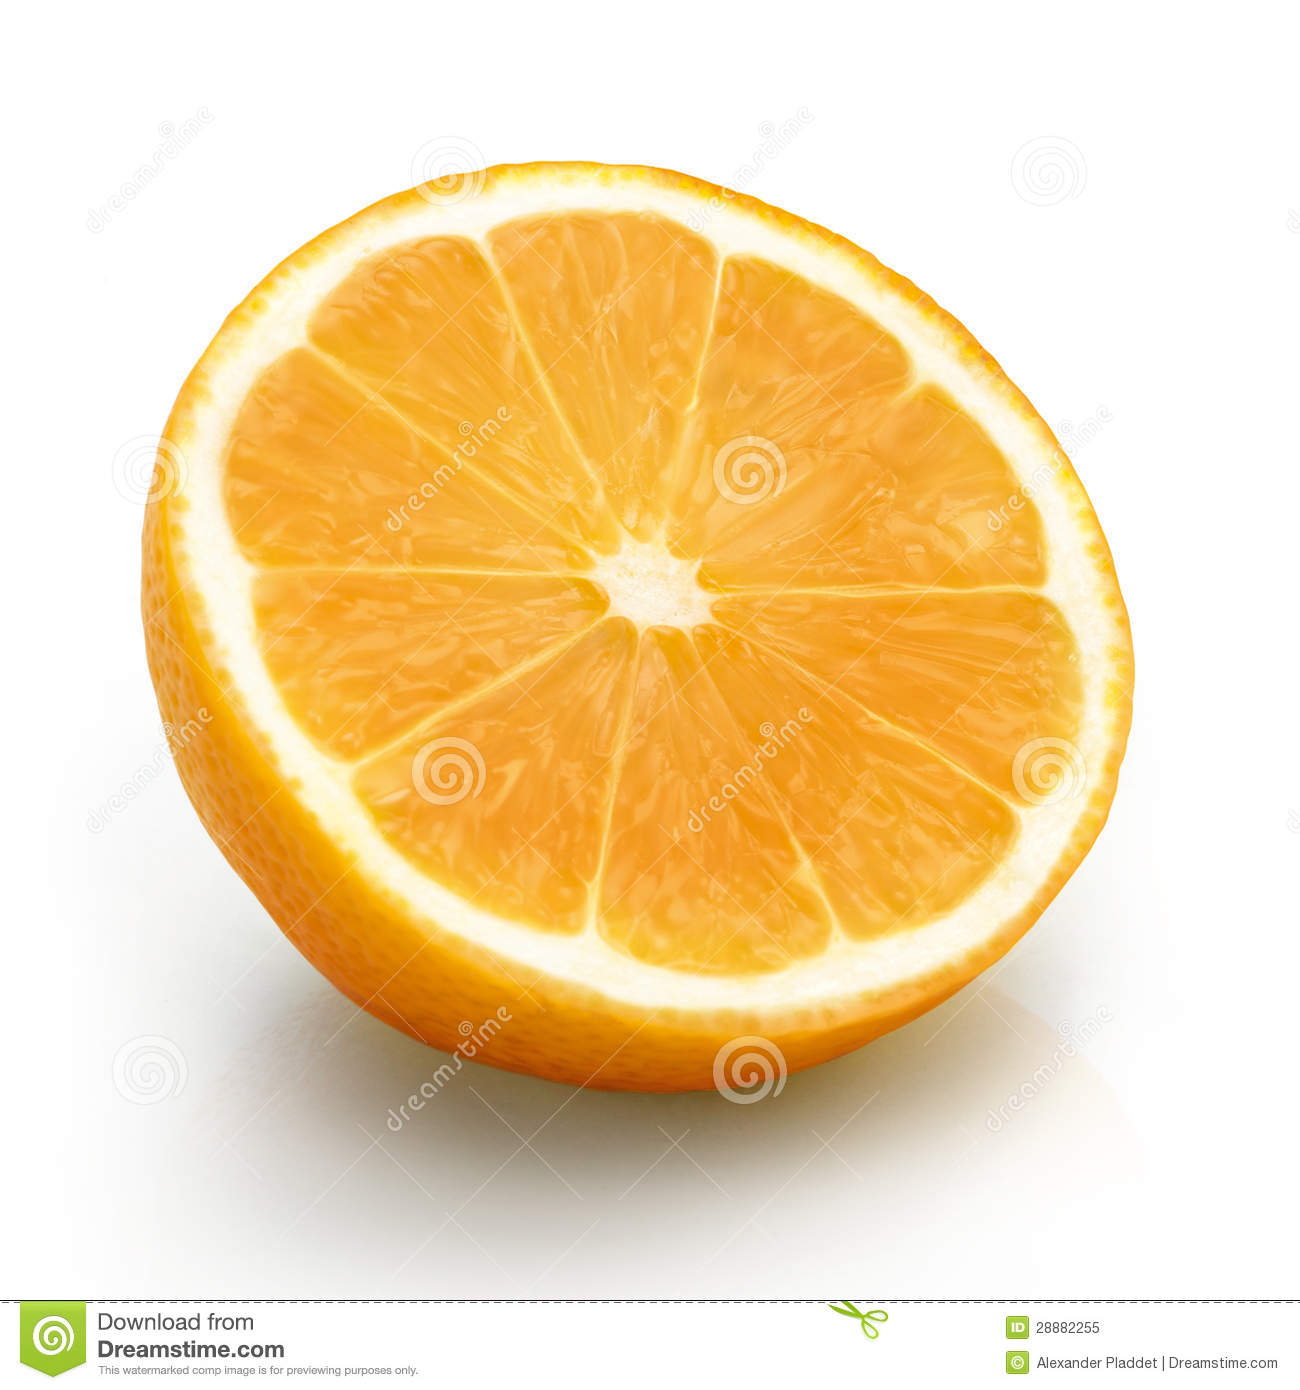 Http Fullhdwall Com Orange Slice Background Html